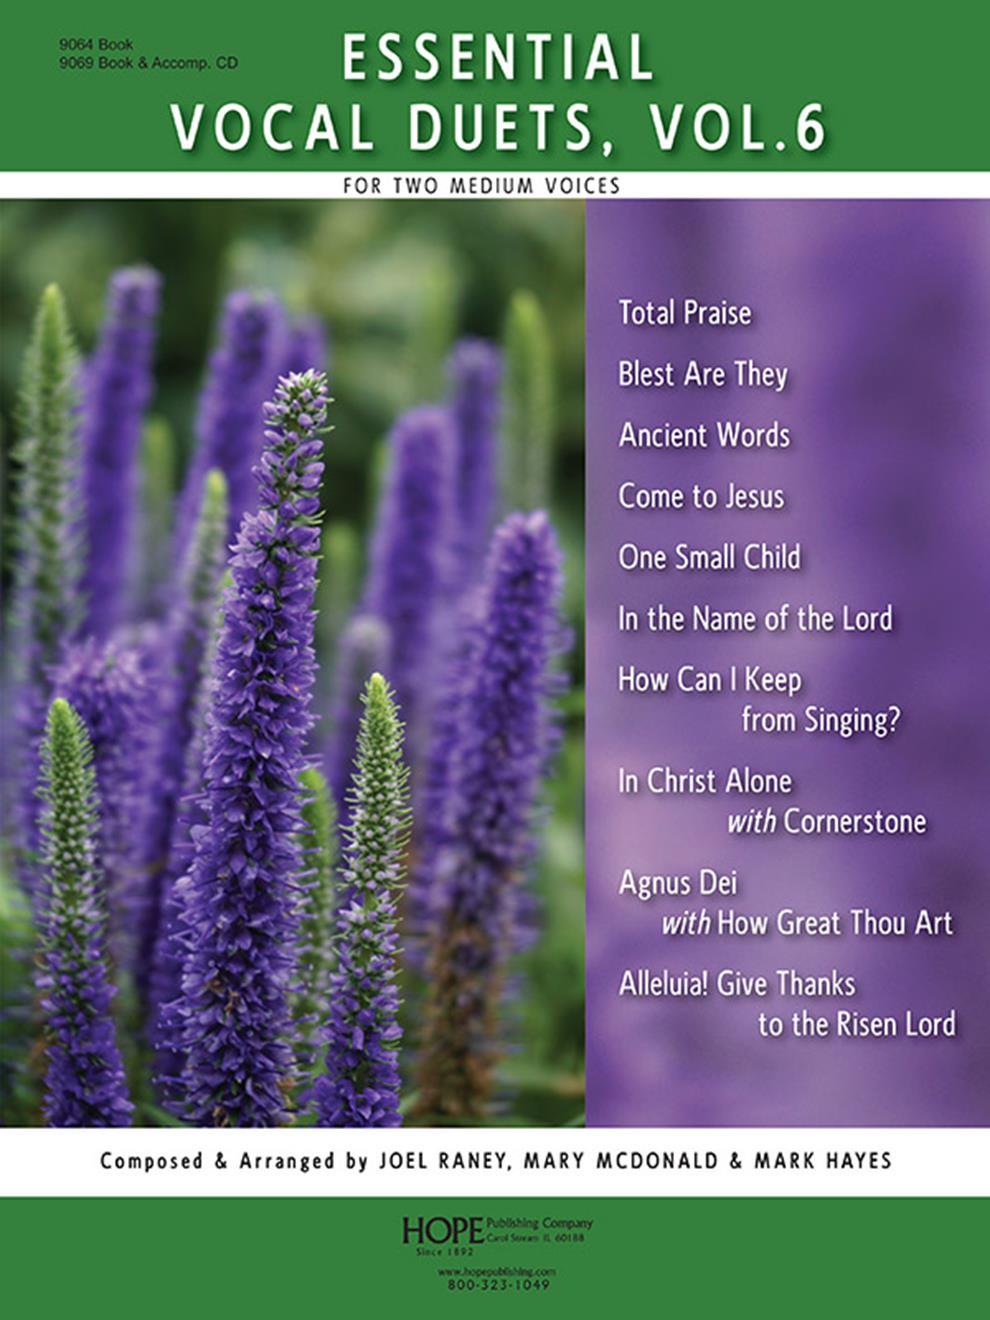 Essential Vocal Duets Vol. 6 - Score Cover Image